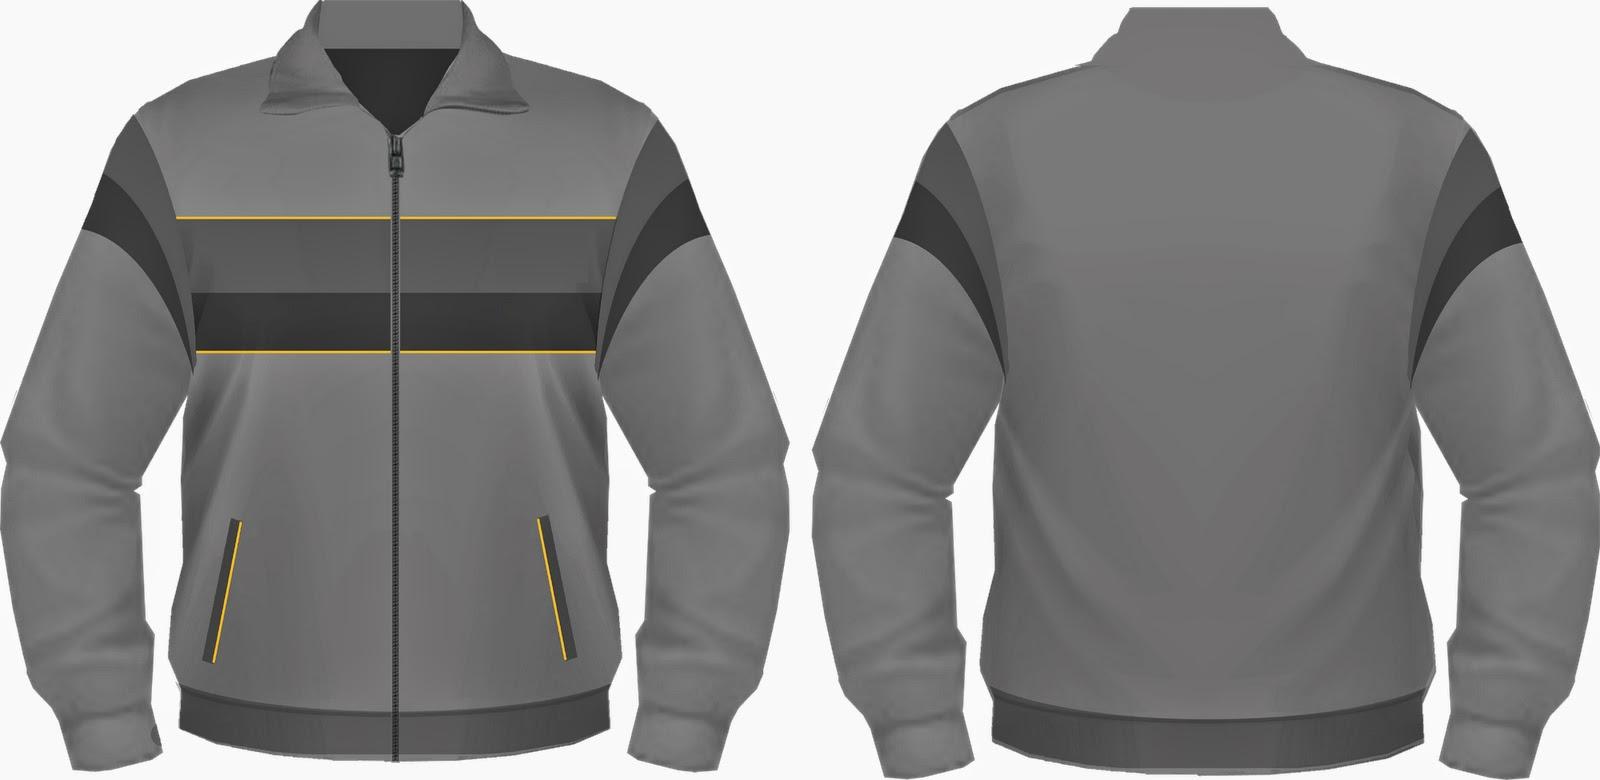 76 Desain Jaket Olahraga Cdr HD Terbaik